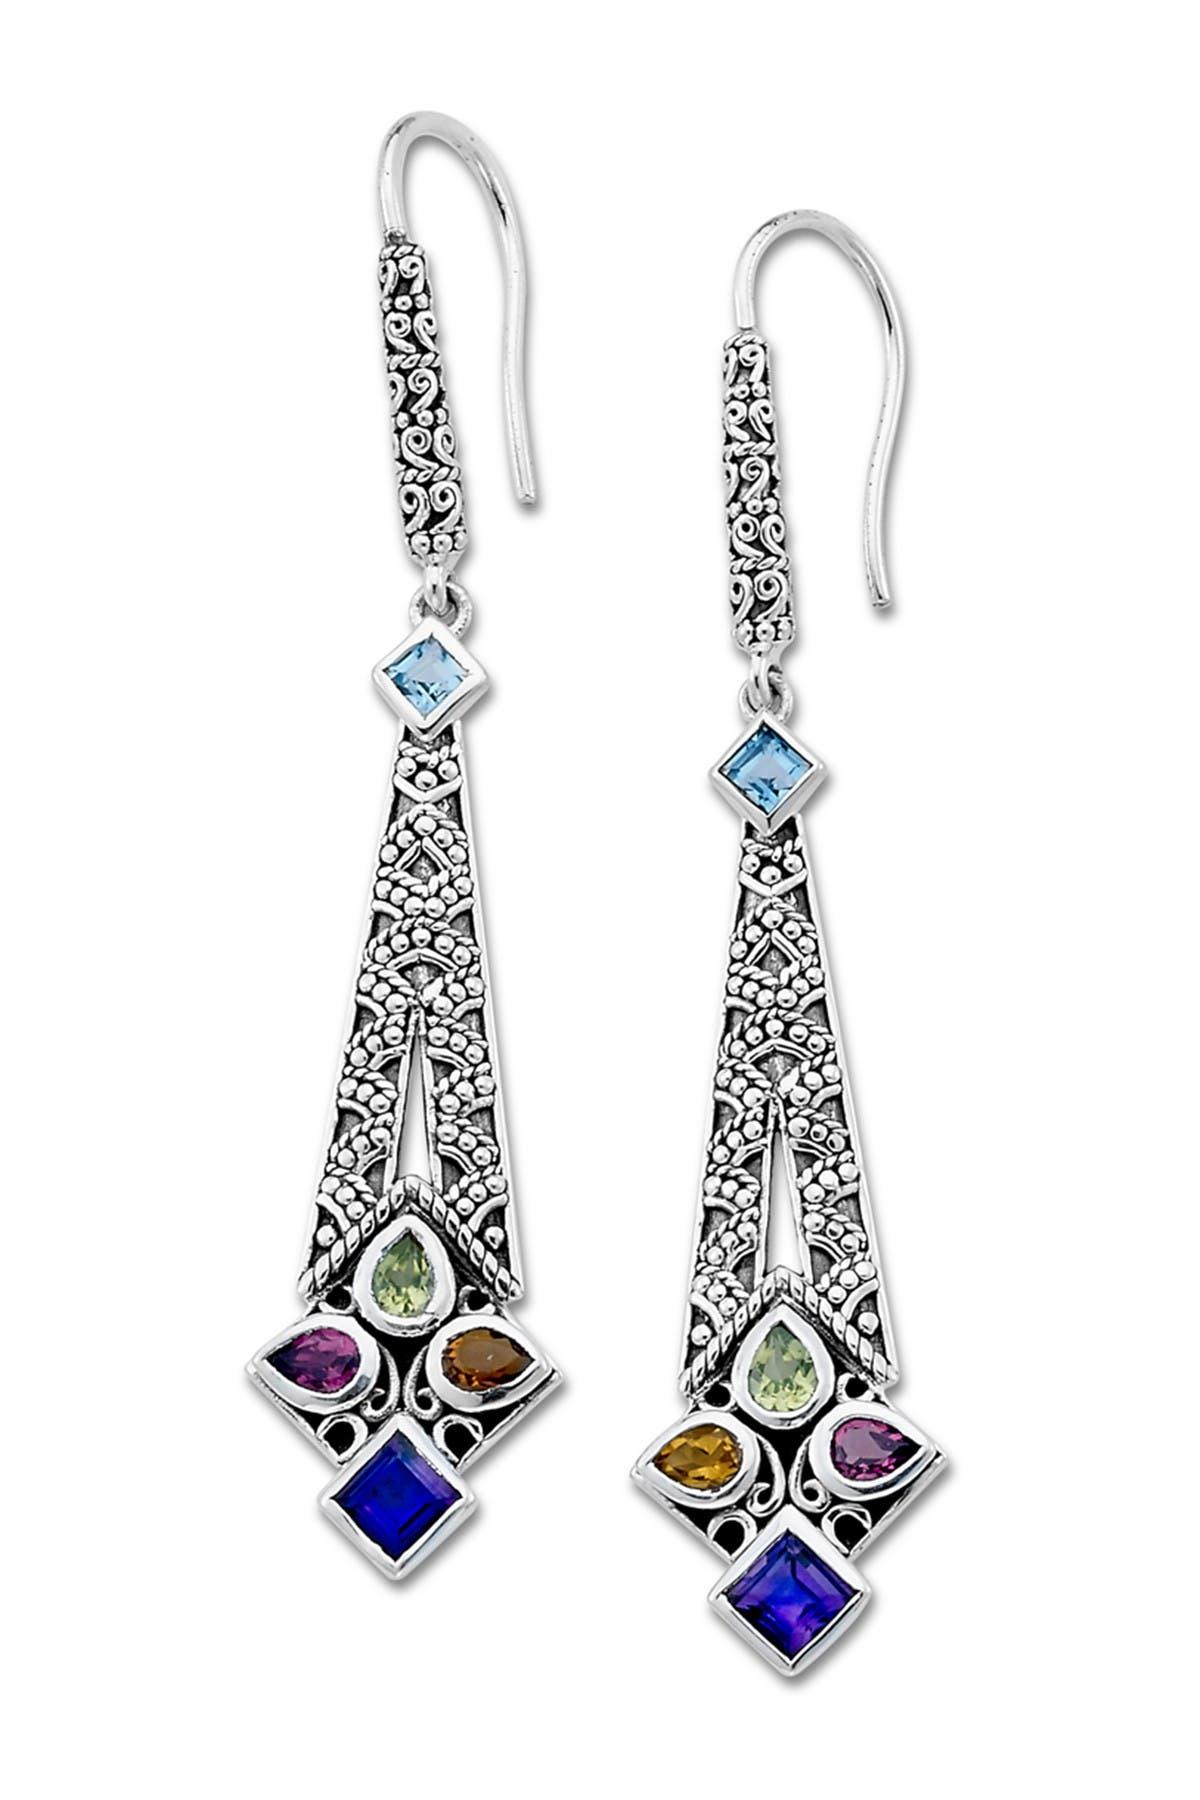 Image of Samuel B Jewelry Sterling Silver Multi Gemstone Earrings